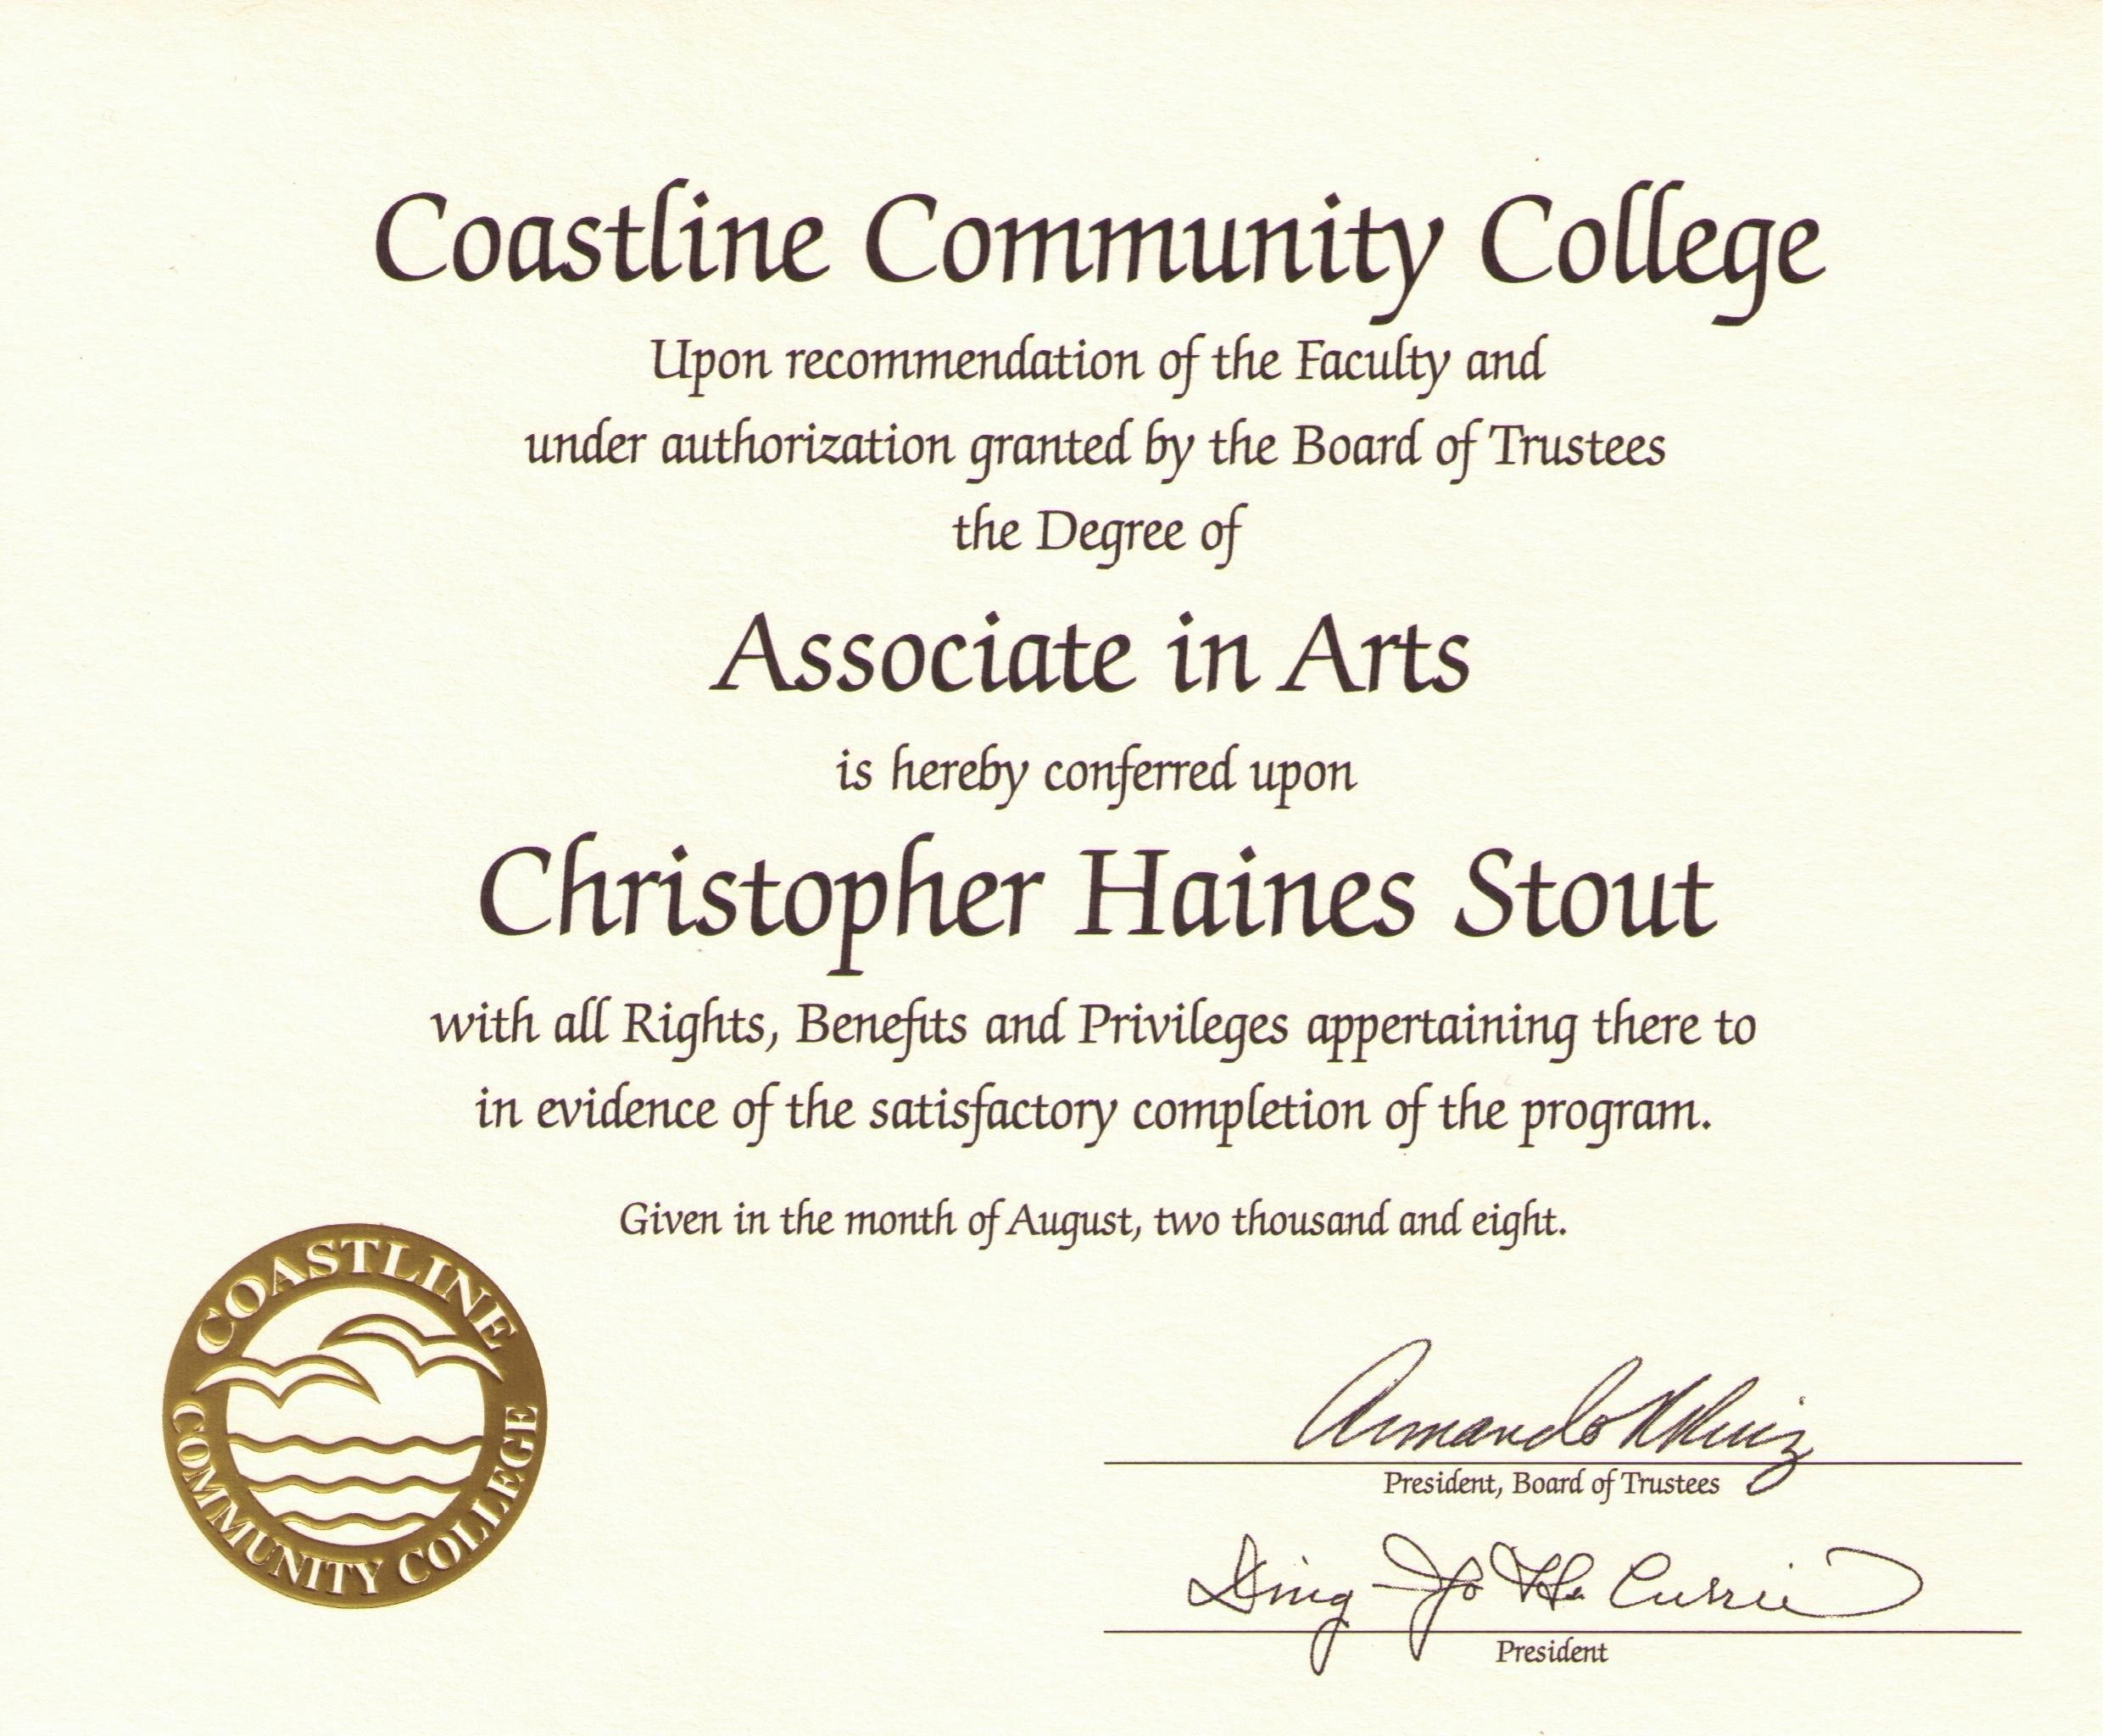 Free Printable College Diploma   Free Diploma Templates   In1 - Free Printable College Degrees